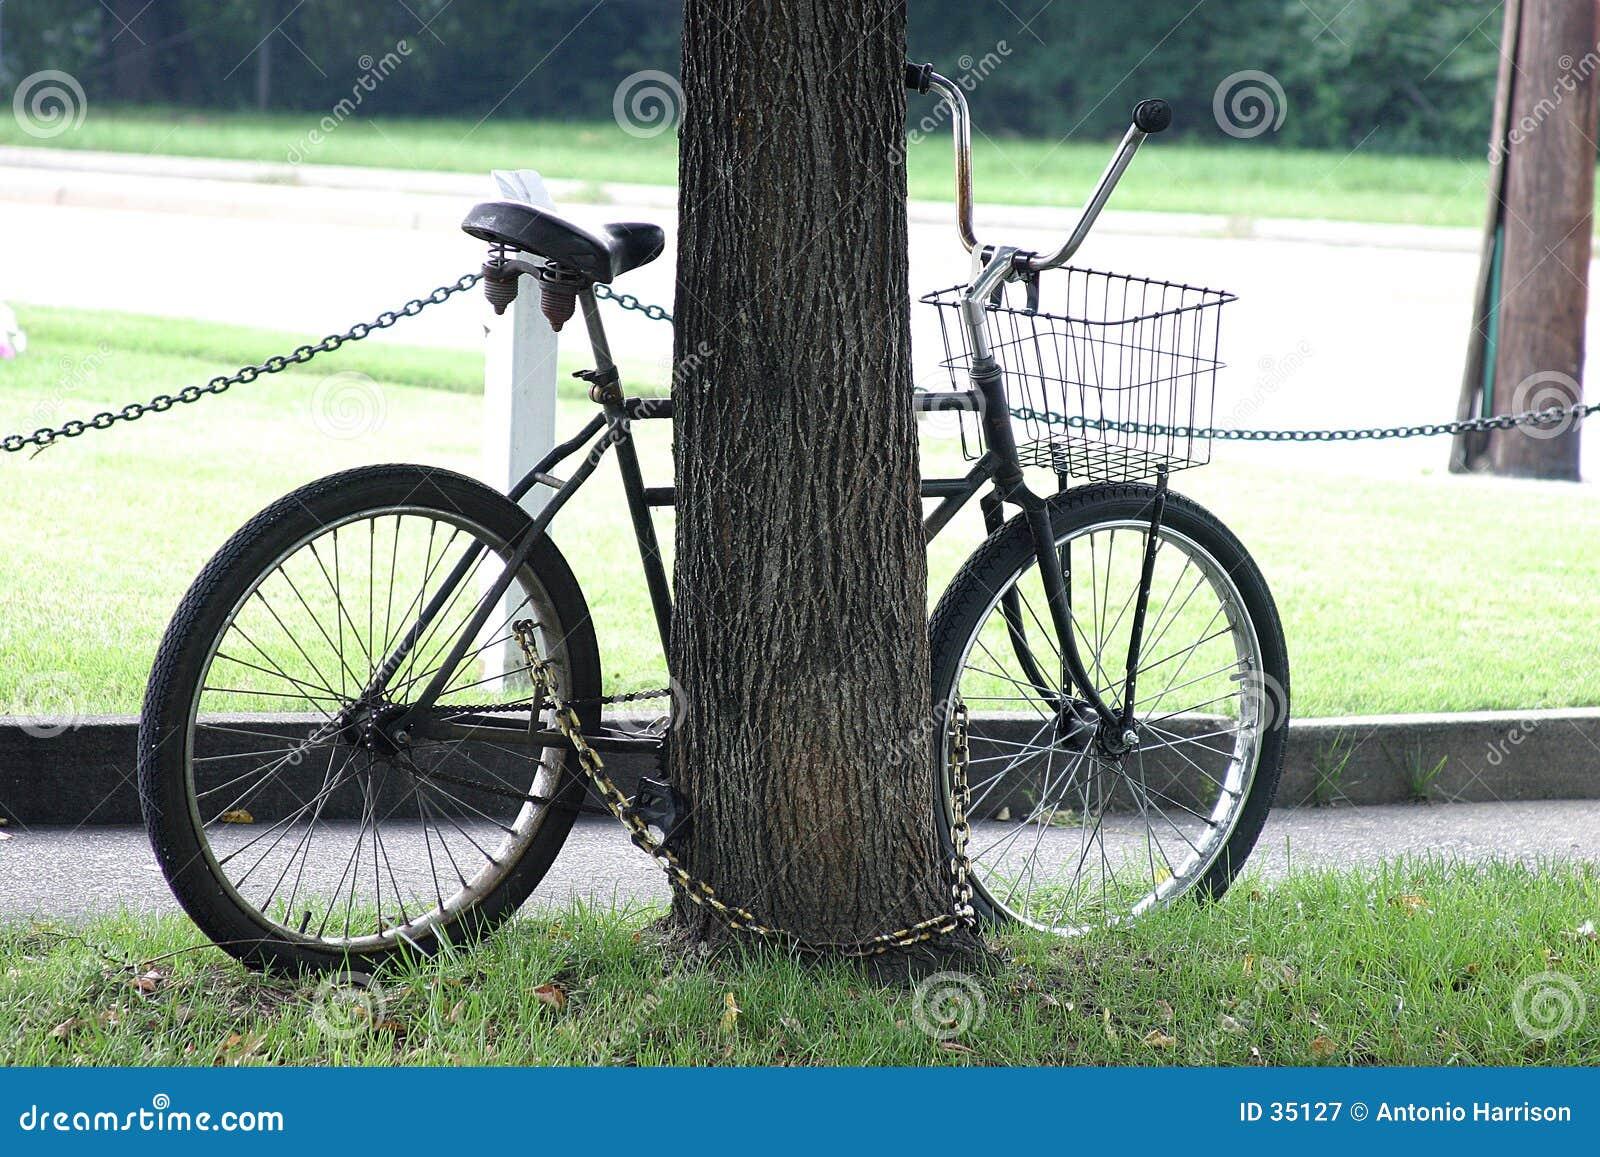 Chained bike